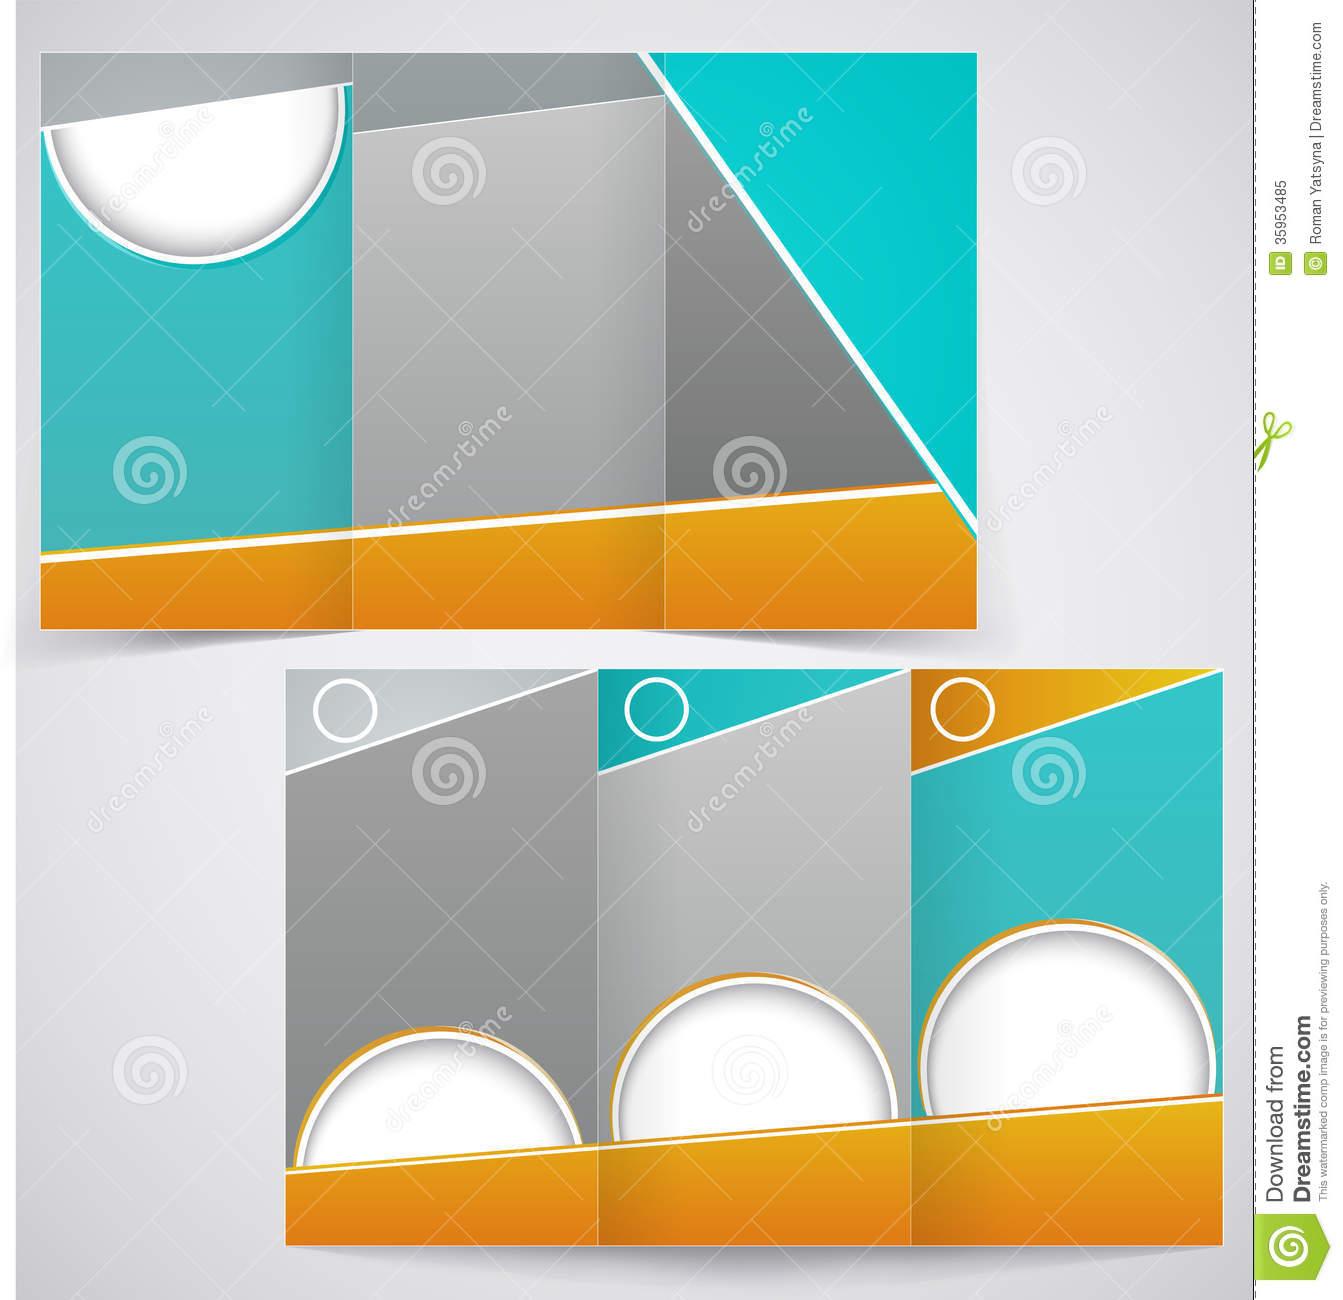 12 Free Vector Brochure Templates Images Business Brochure